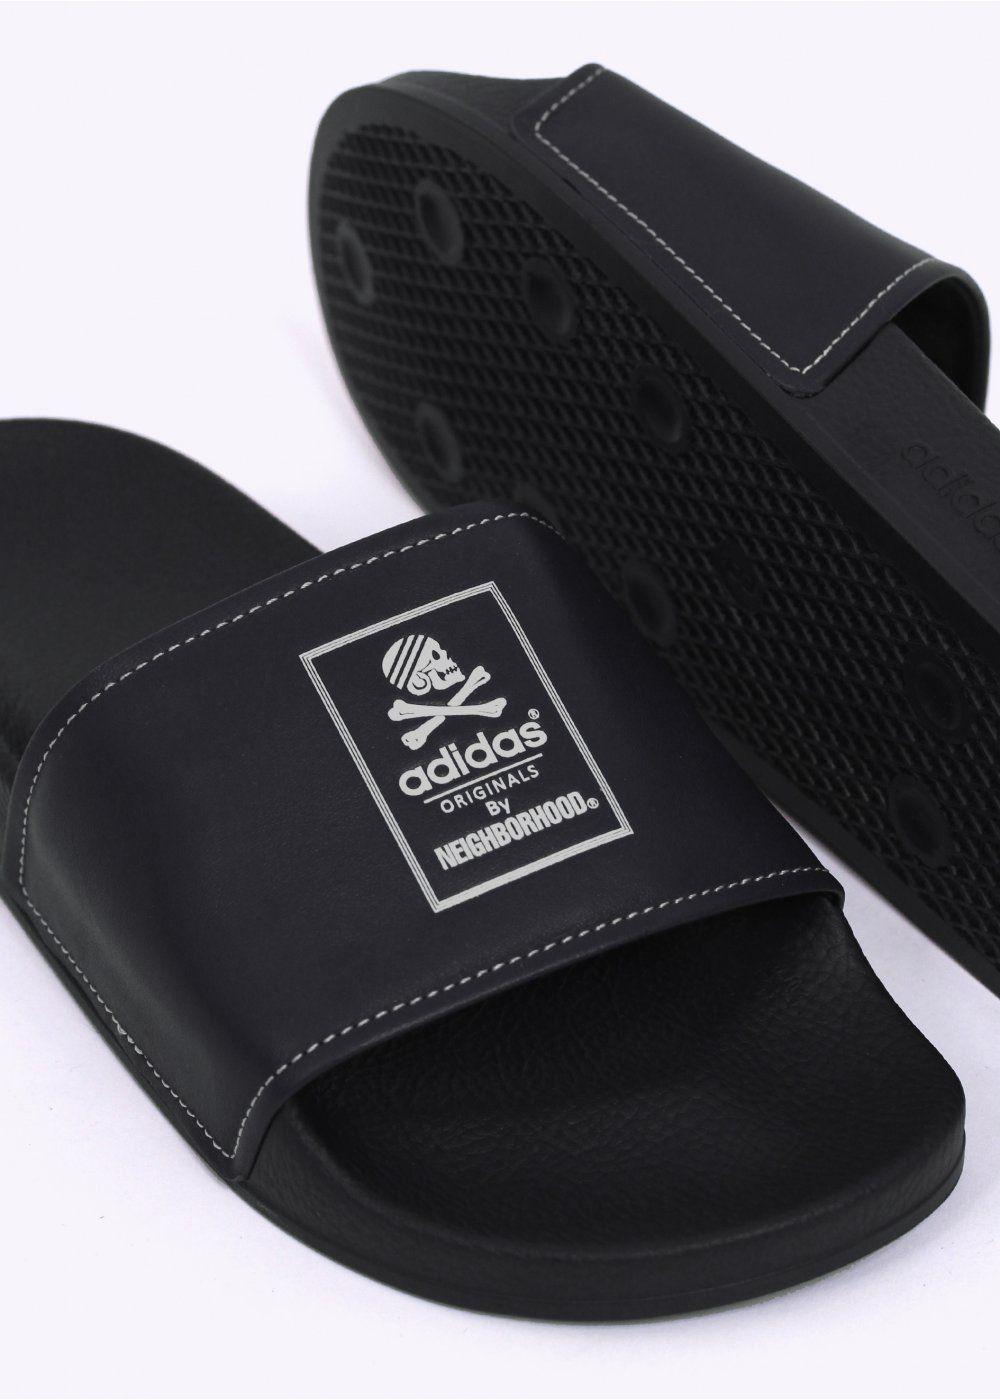 c27f71e01676 Adidas Originals x Neighborhood Adilette - Black